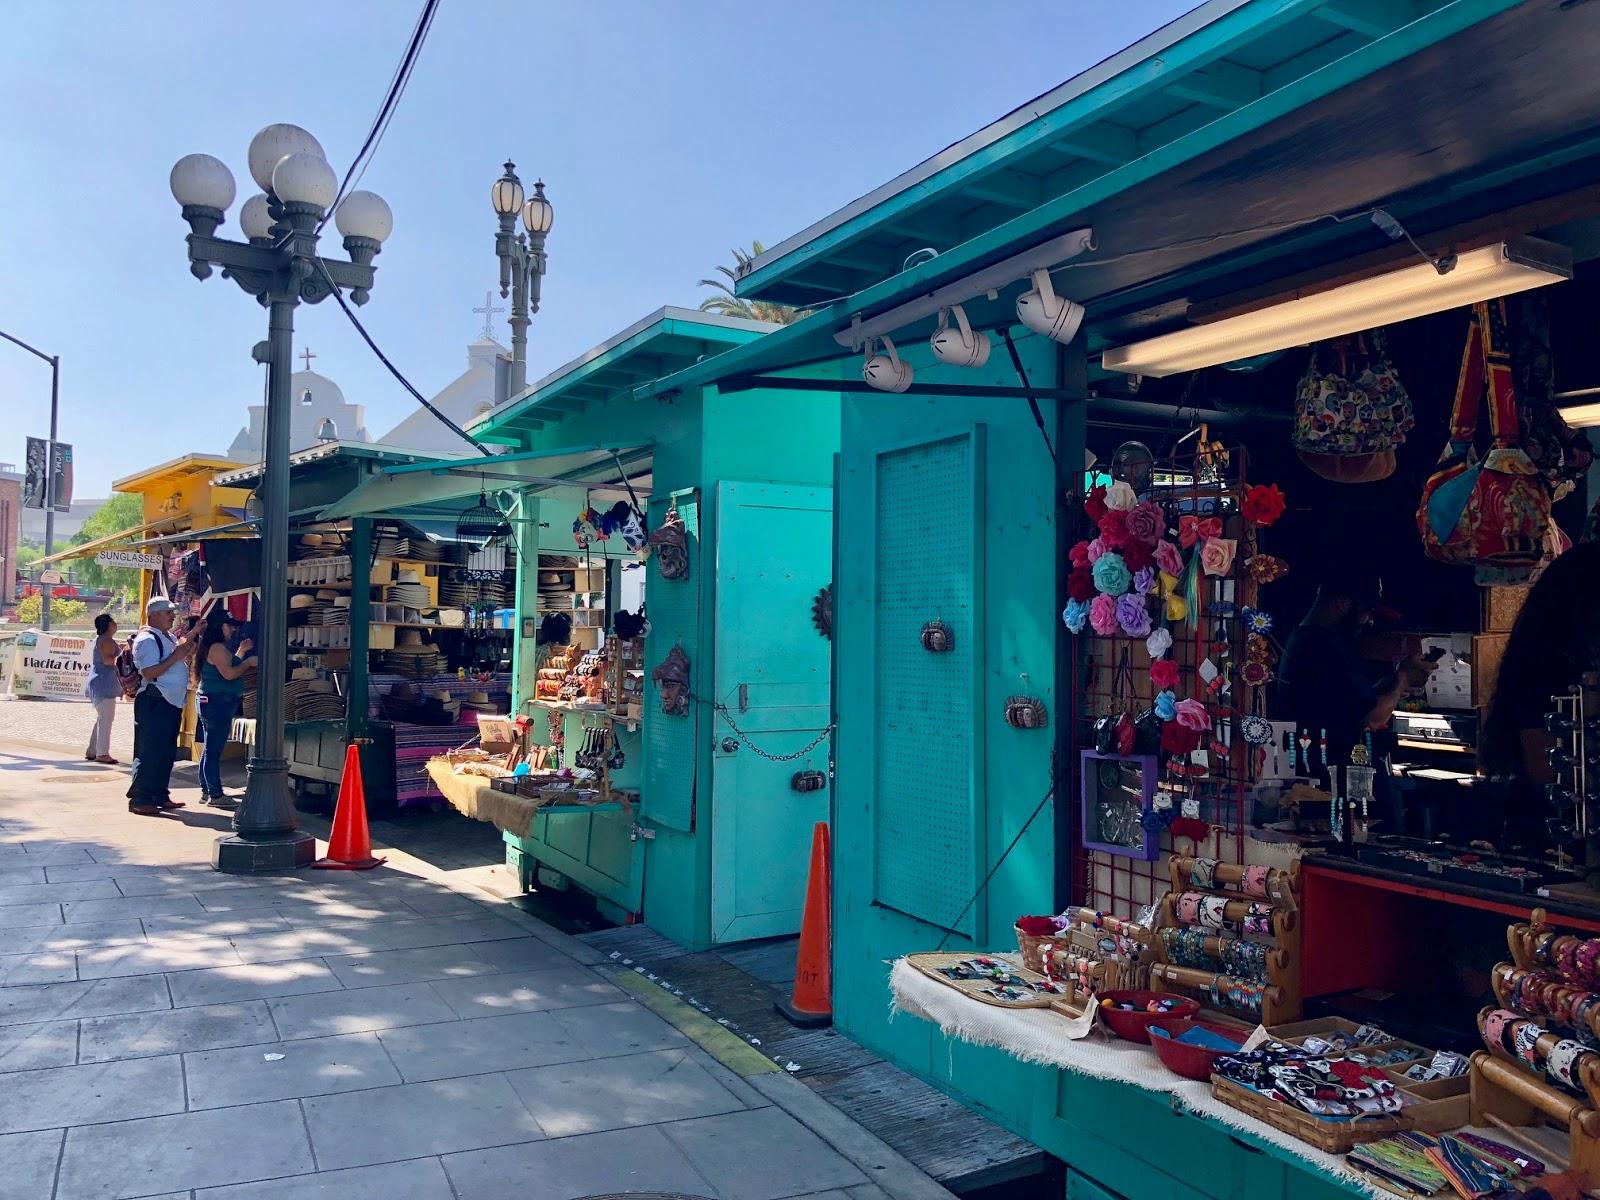 Olvera Street Vendors - Life in Wanderlust